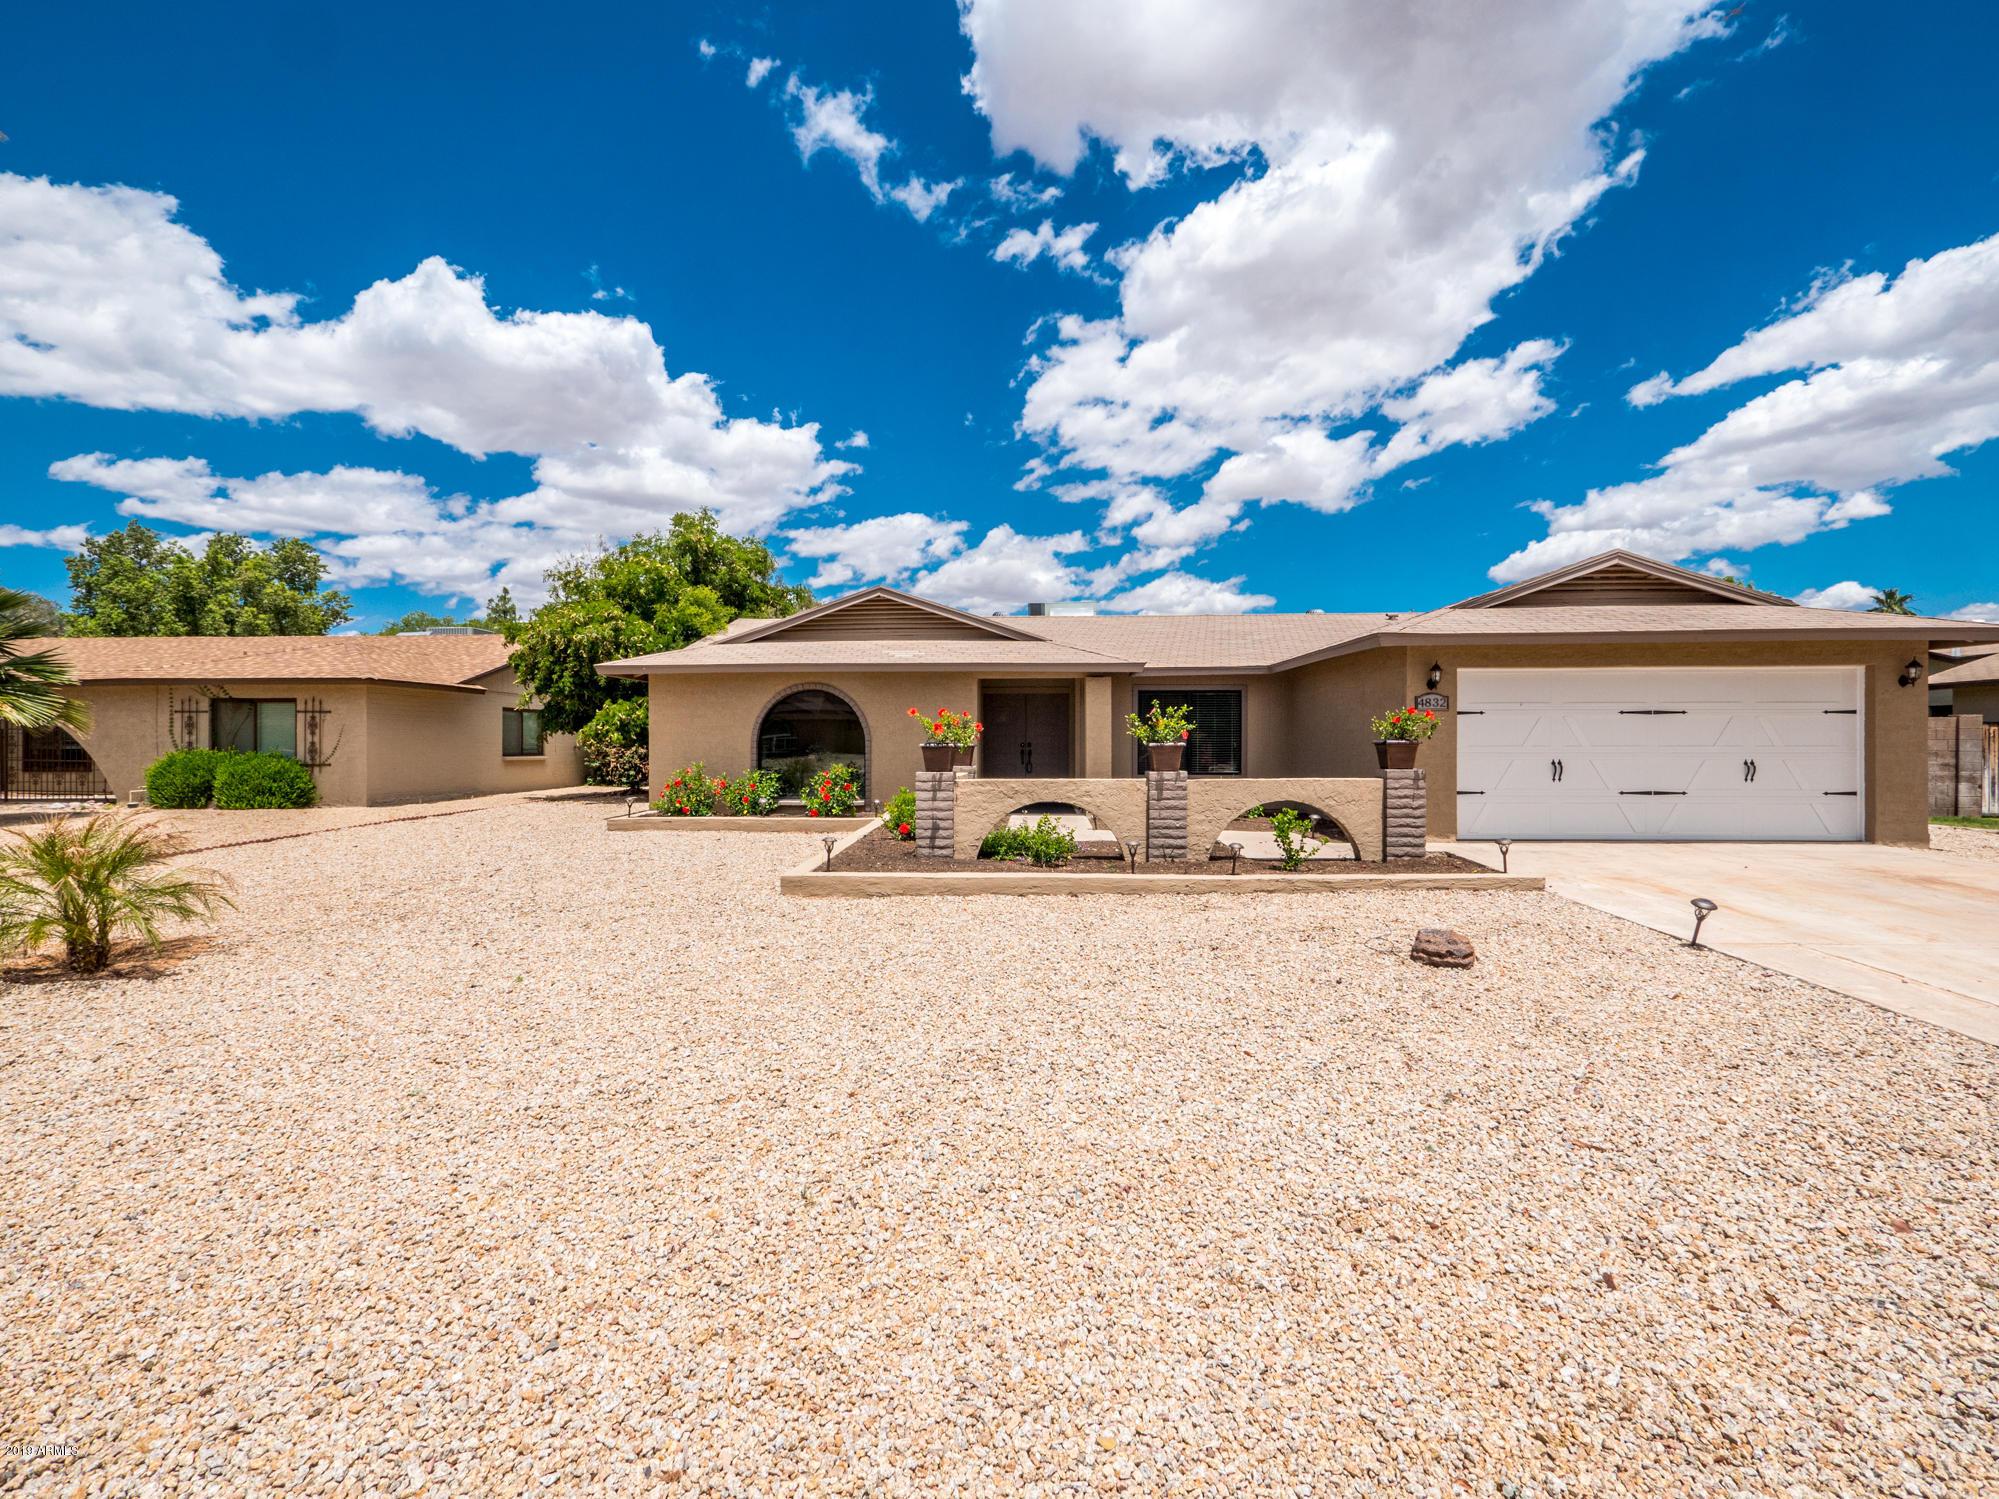 4832 E CROCUS Drive, Scottsdale, Arizona